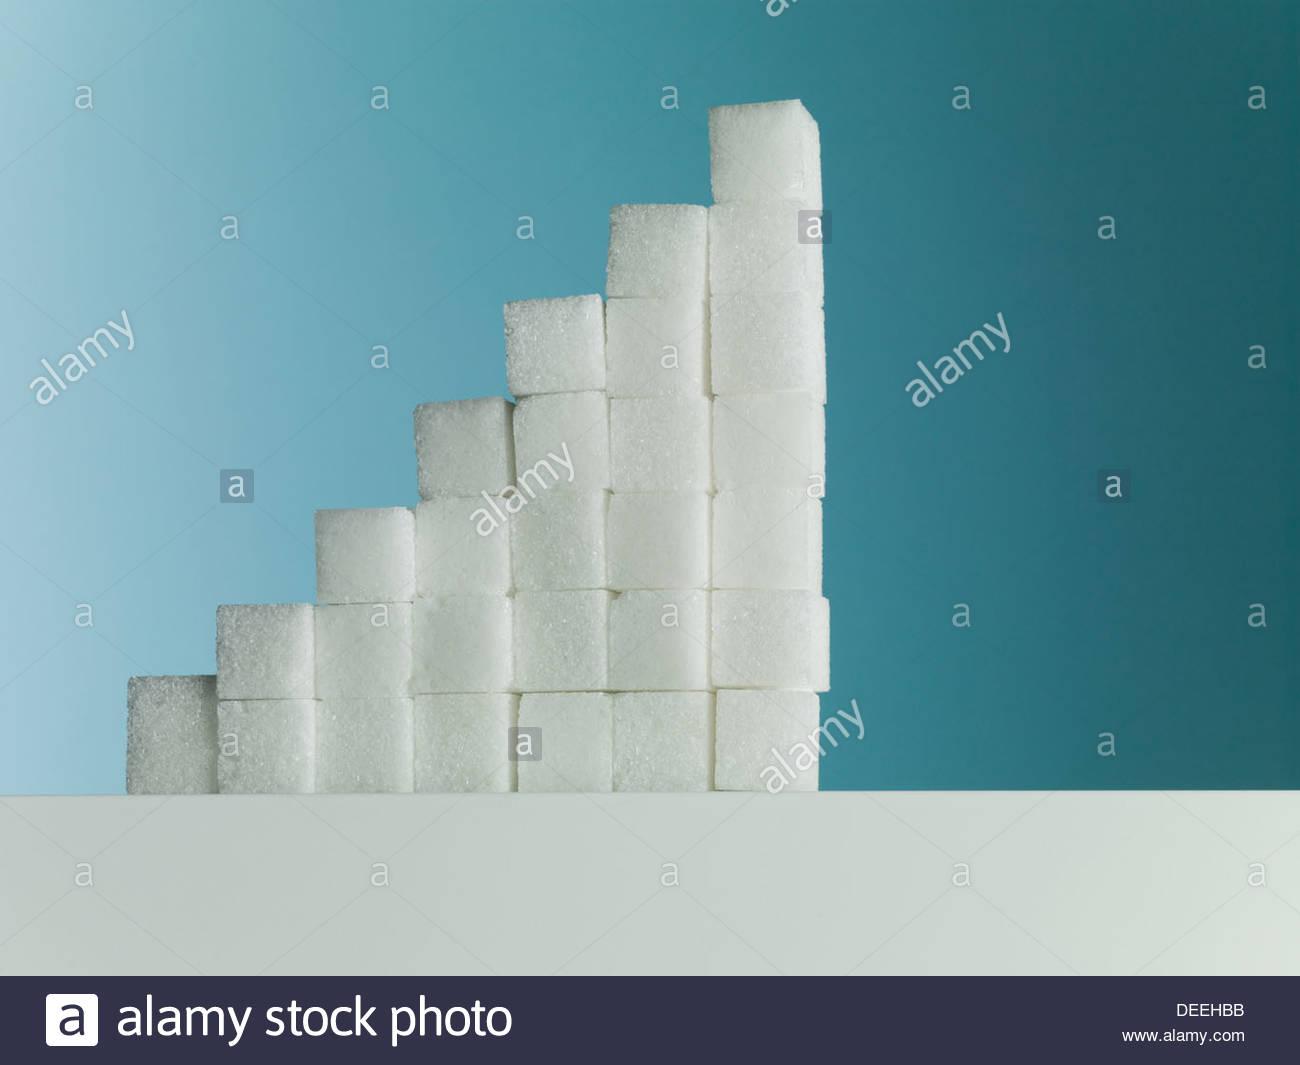 Fila de ascendente montones de cubos de azúcar Imagen De Stock